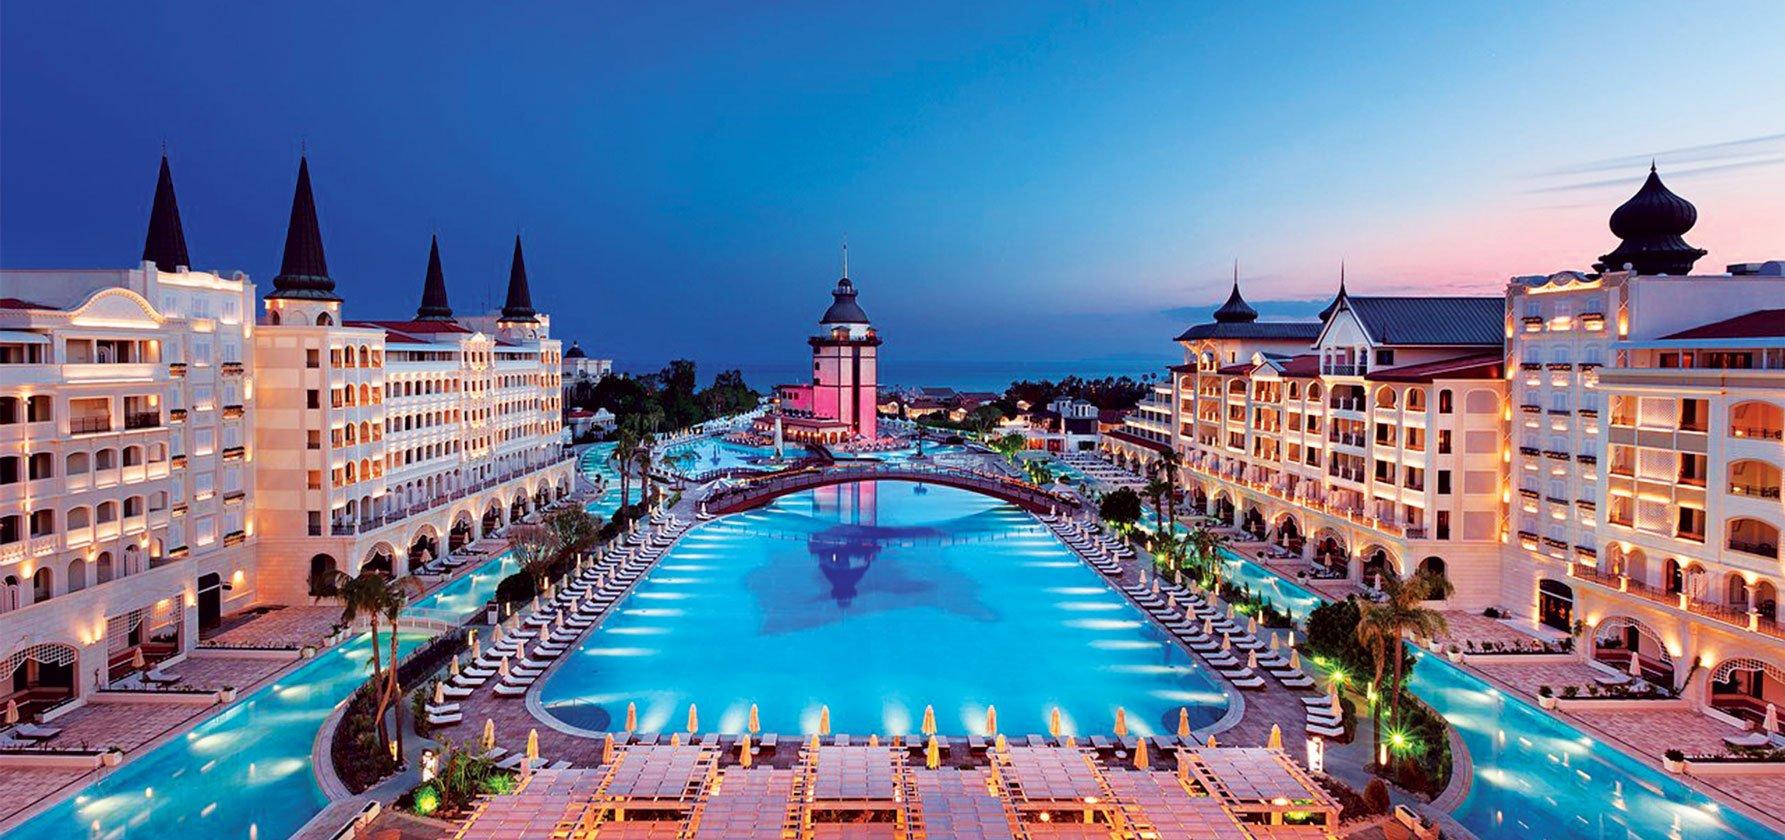 Titanic-Mardan-Palace-_-Antalya,-Turkey-1